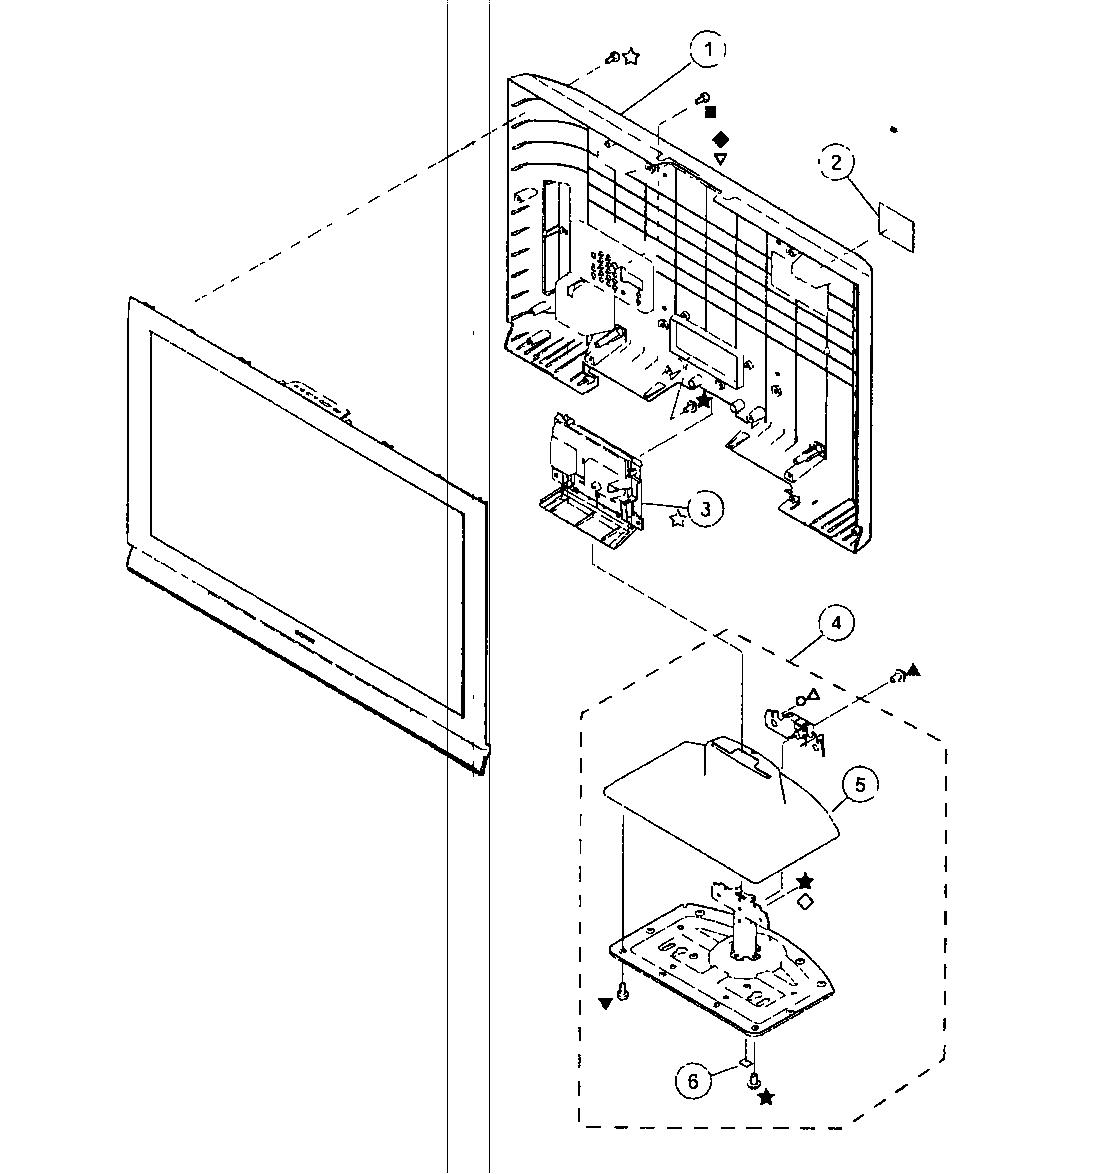 Sony model KDL-37L4000 lcd television genuine parts